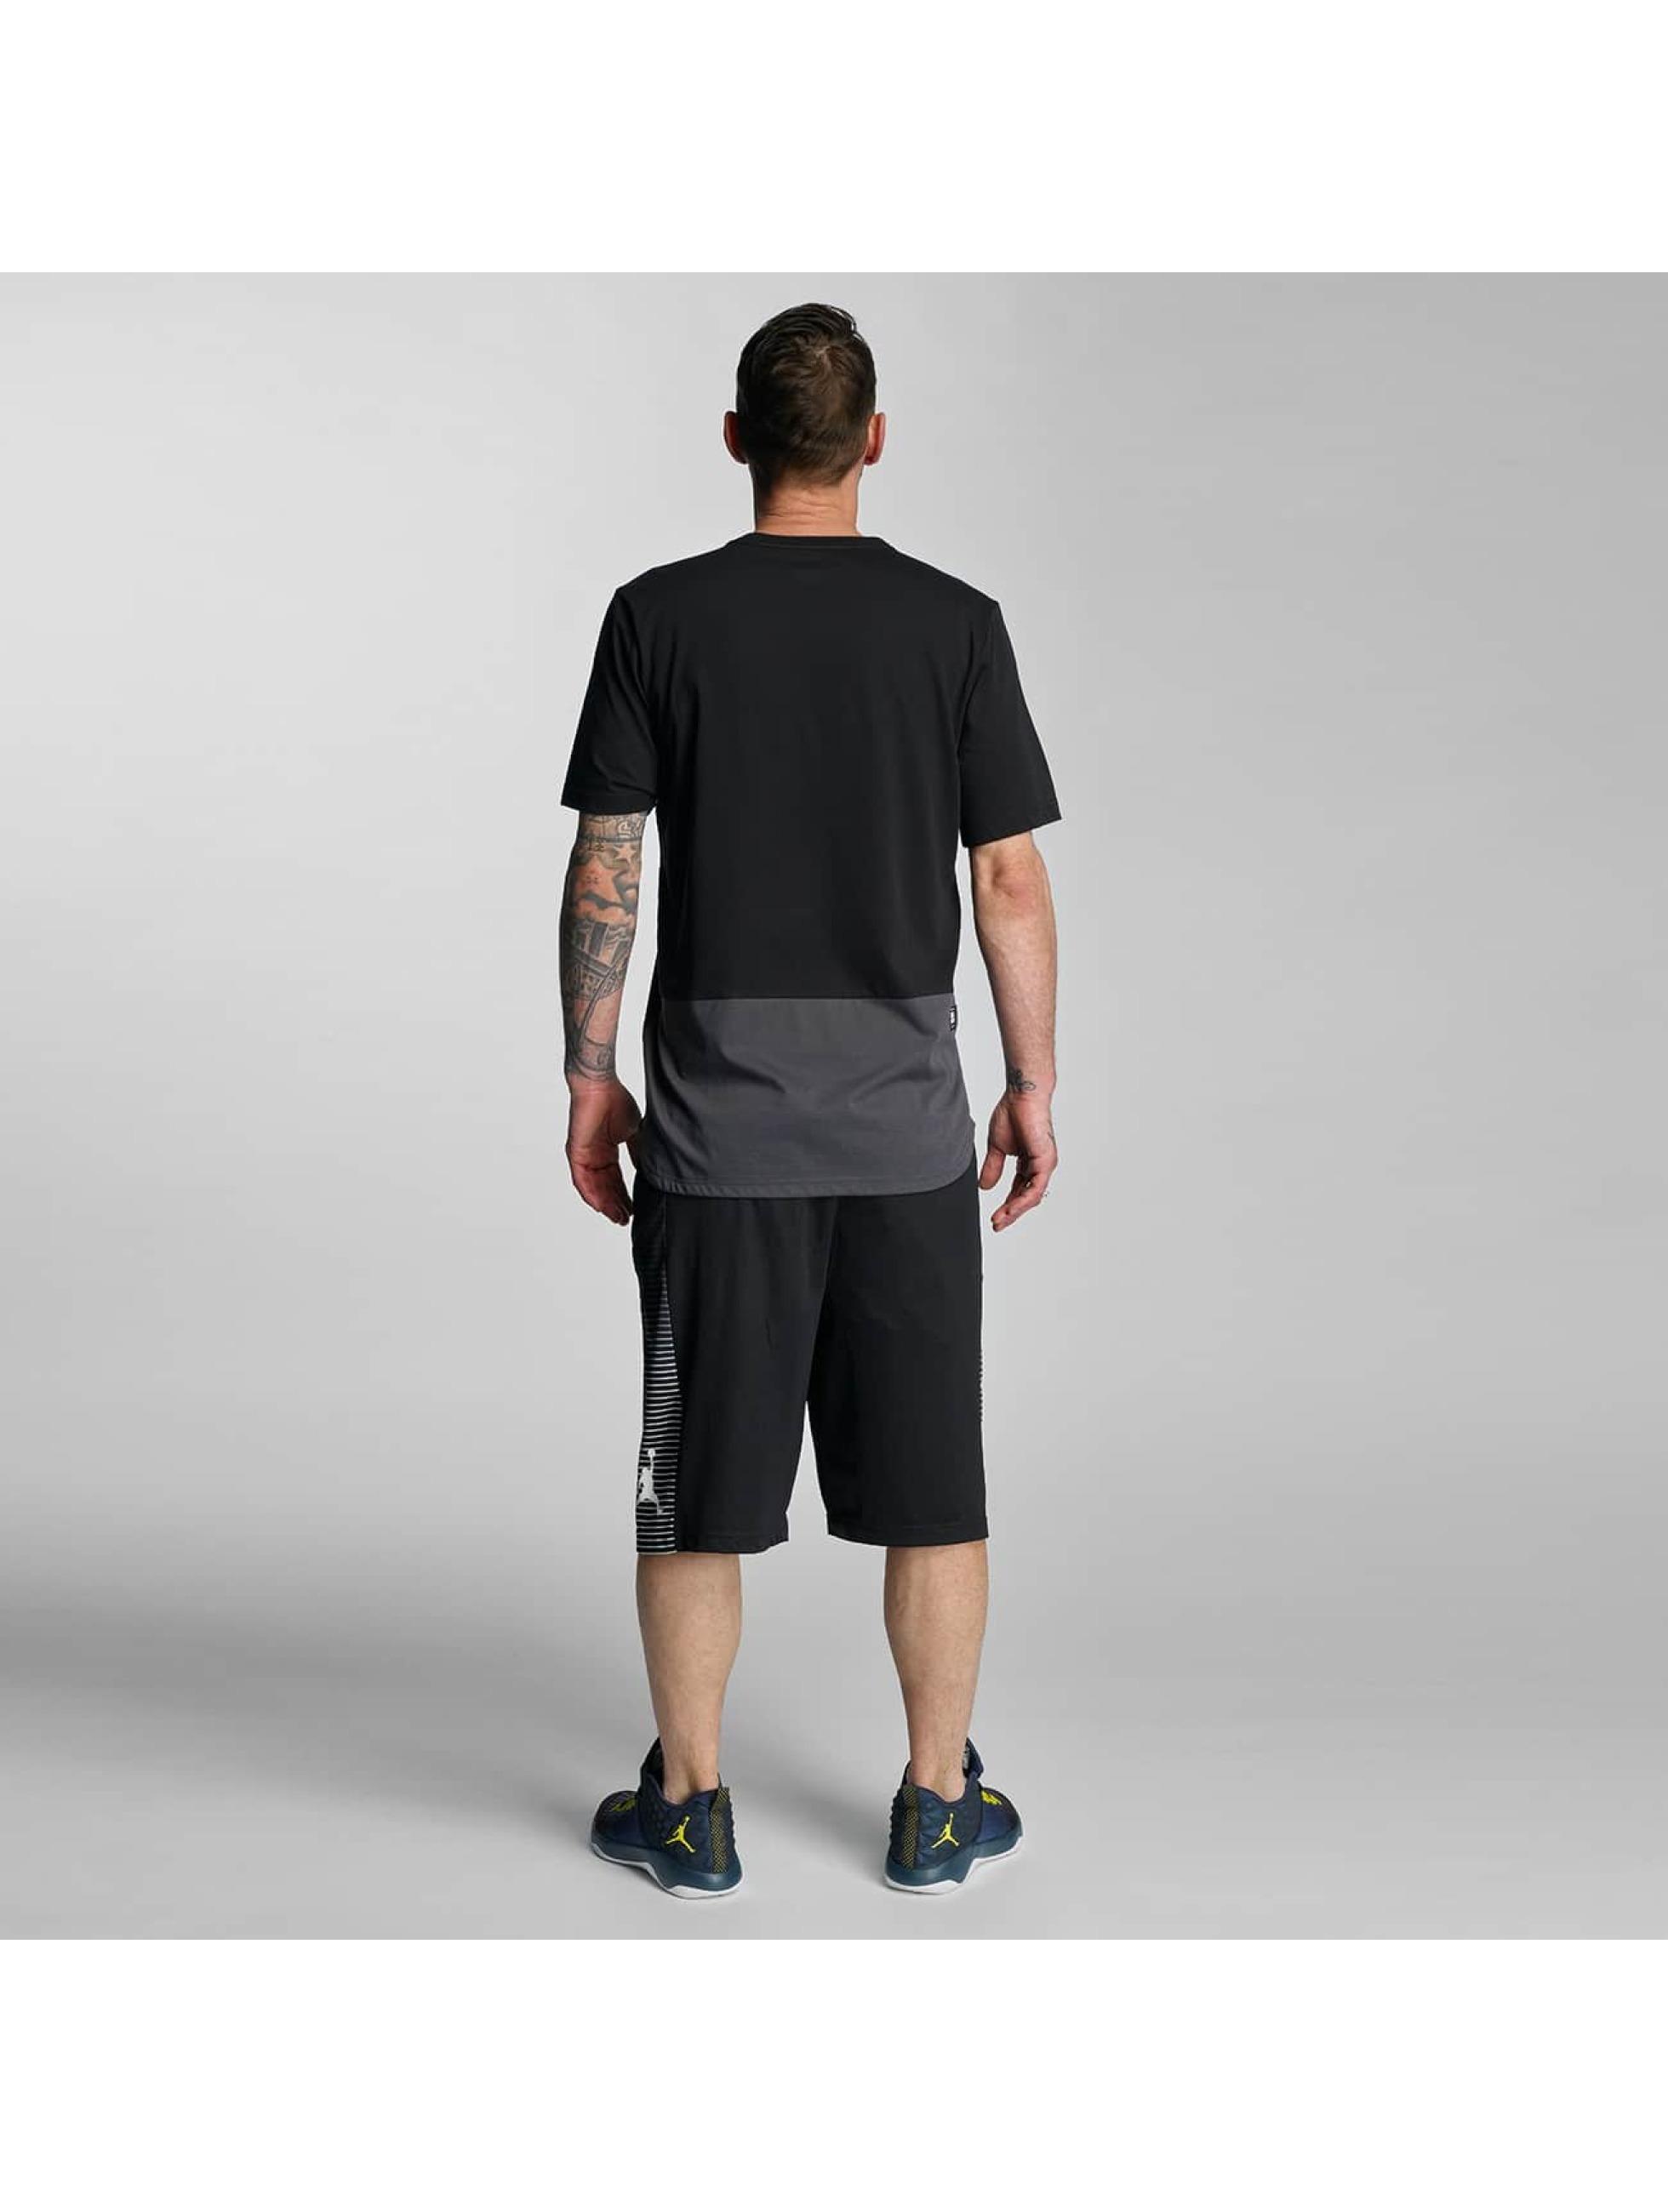 Jordan Shorts BSK Game schwarz